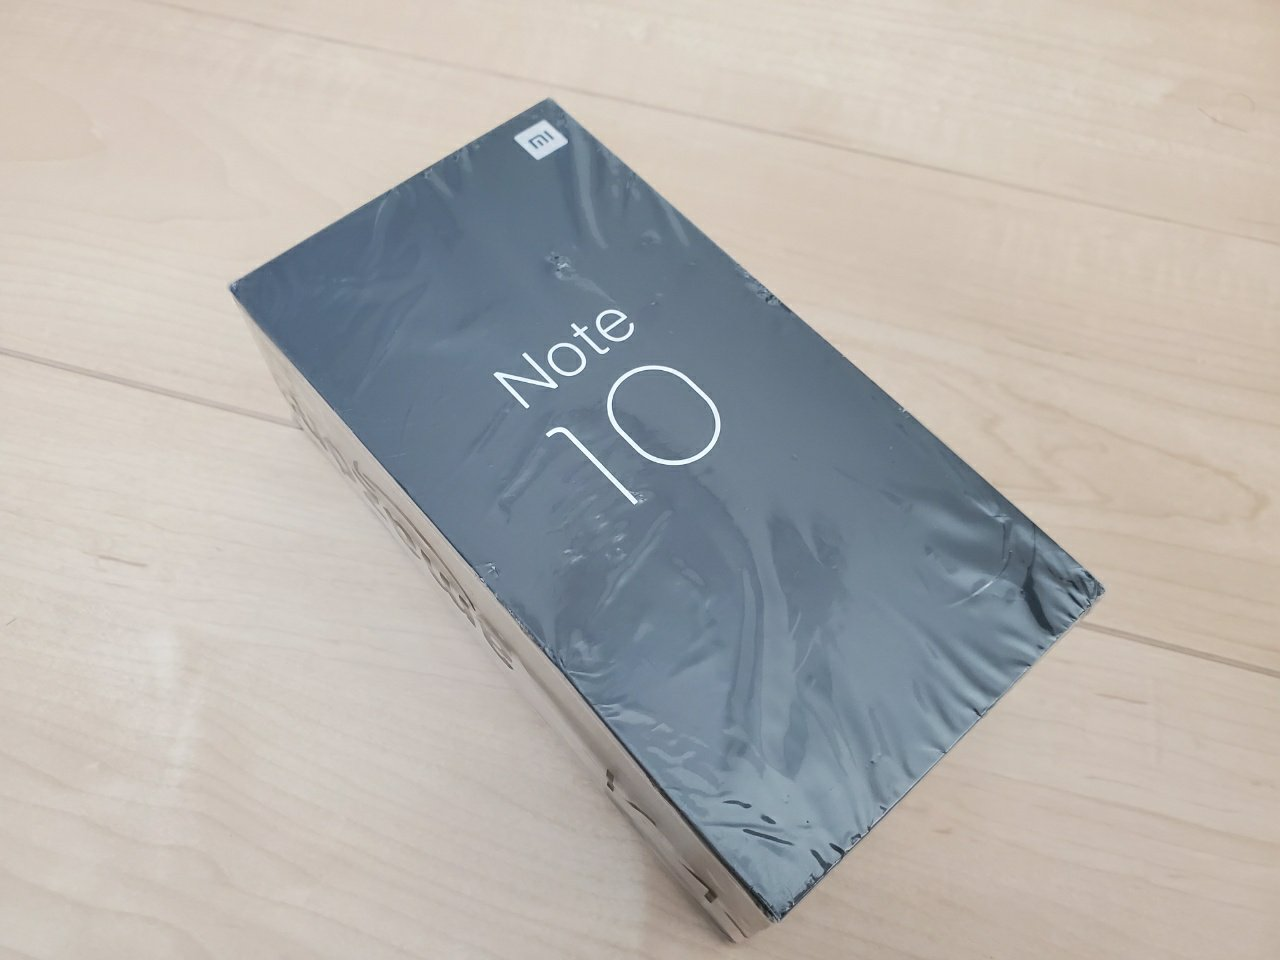 Minote10外箱